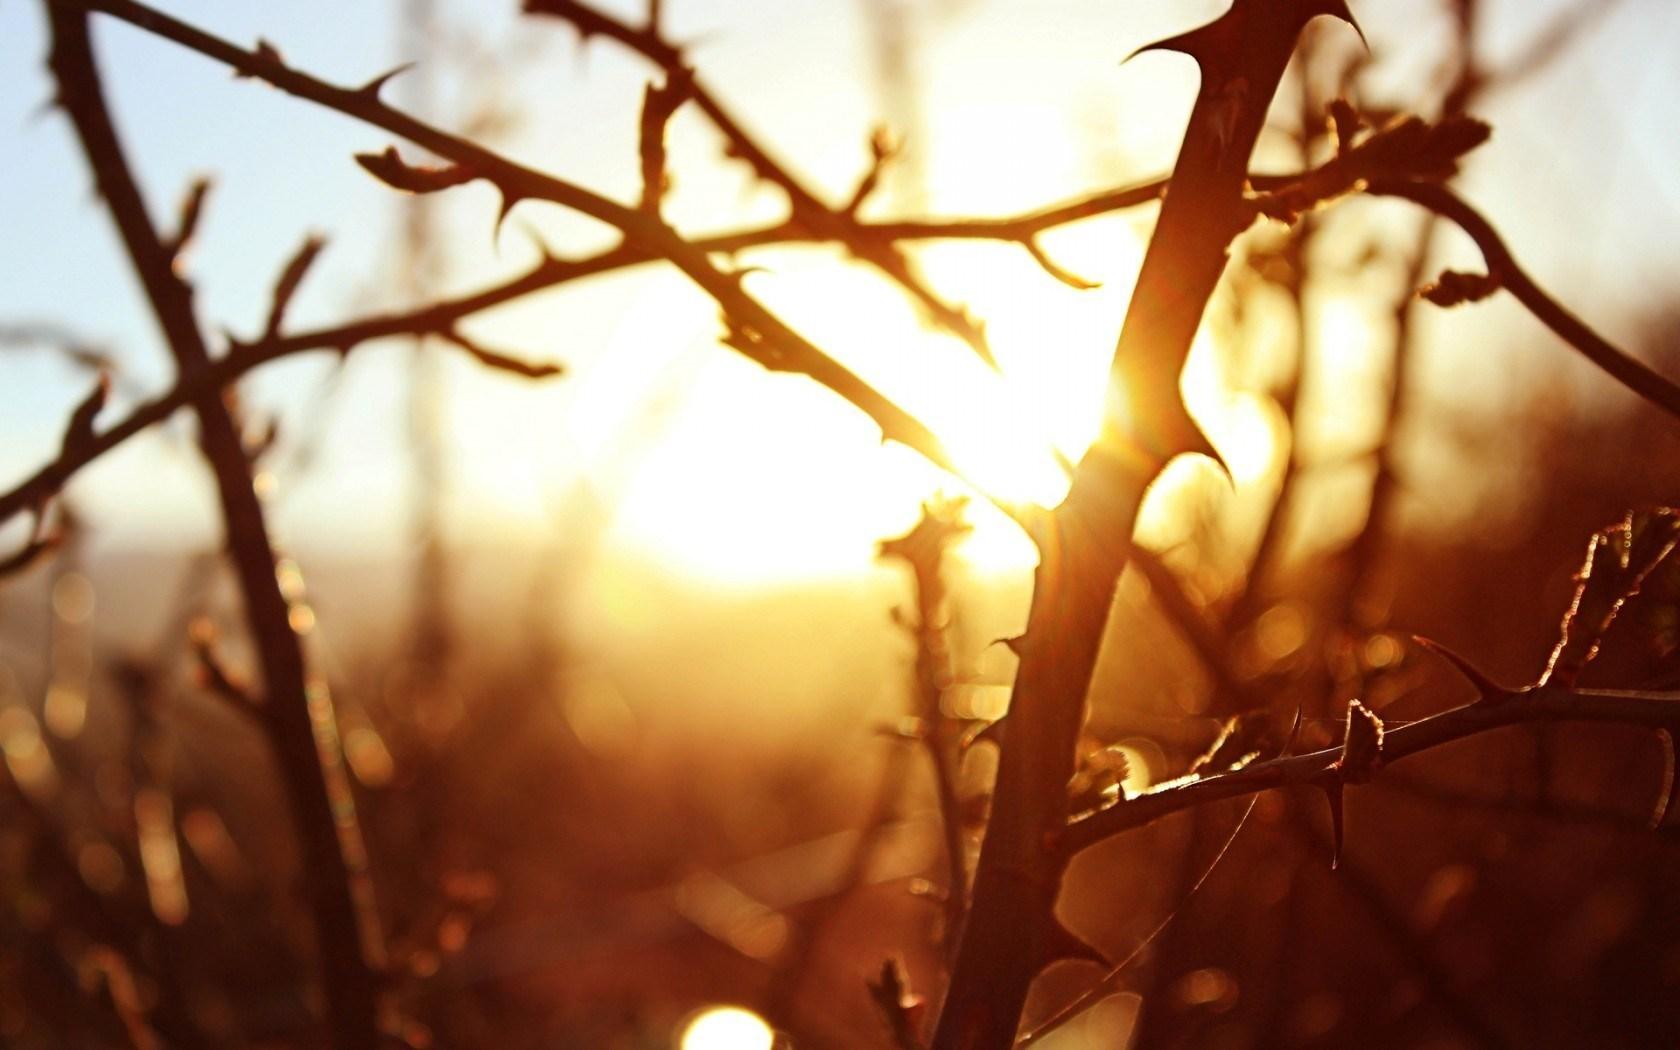 sunset images tree sunset